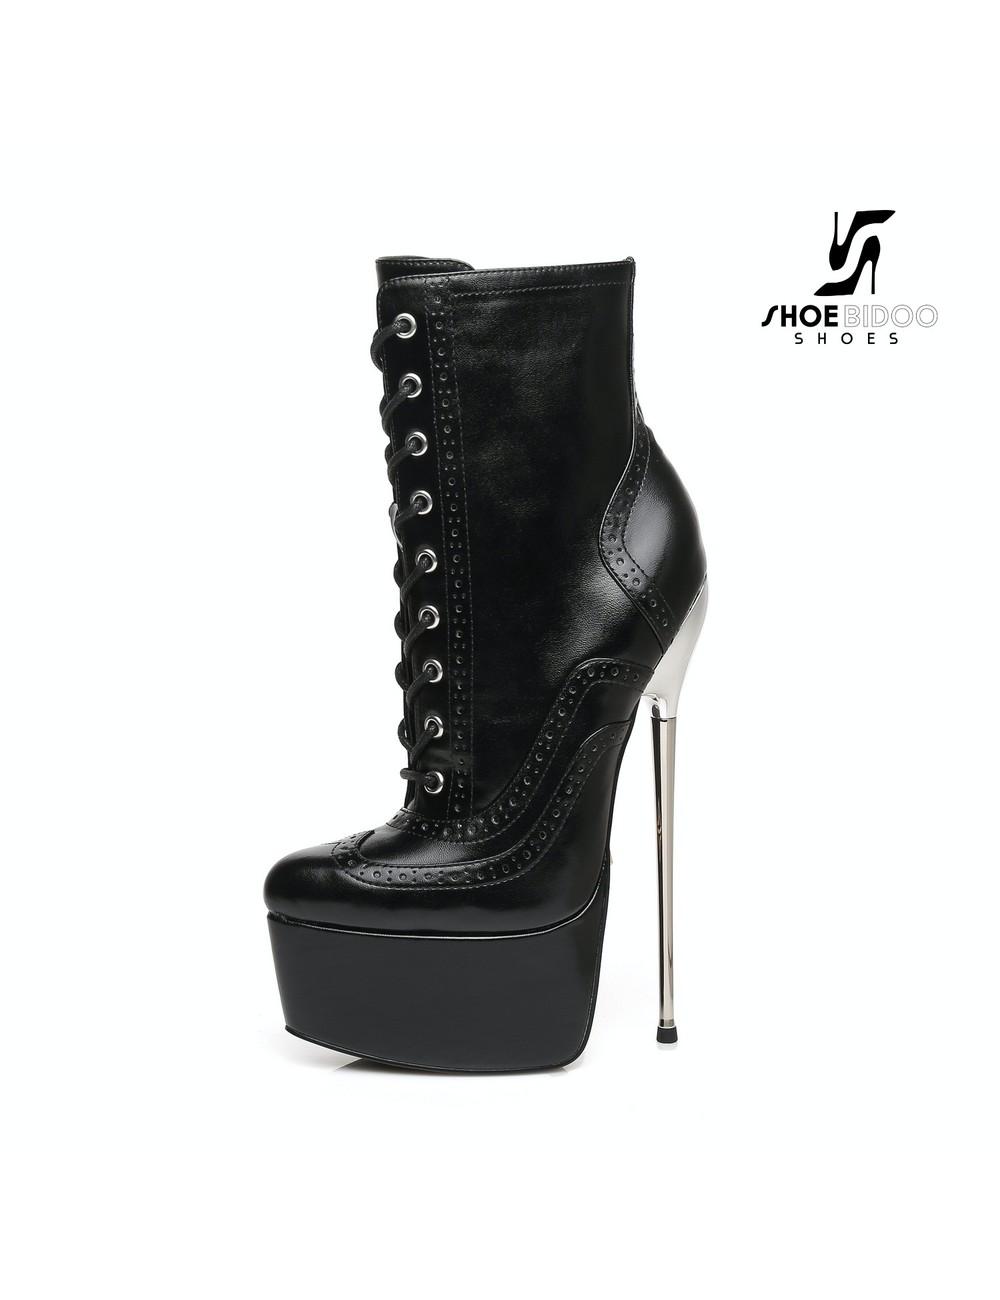 SLICK Black Giaro SLICK Fetish platform booties with silver heels